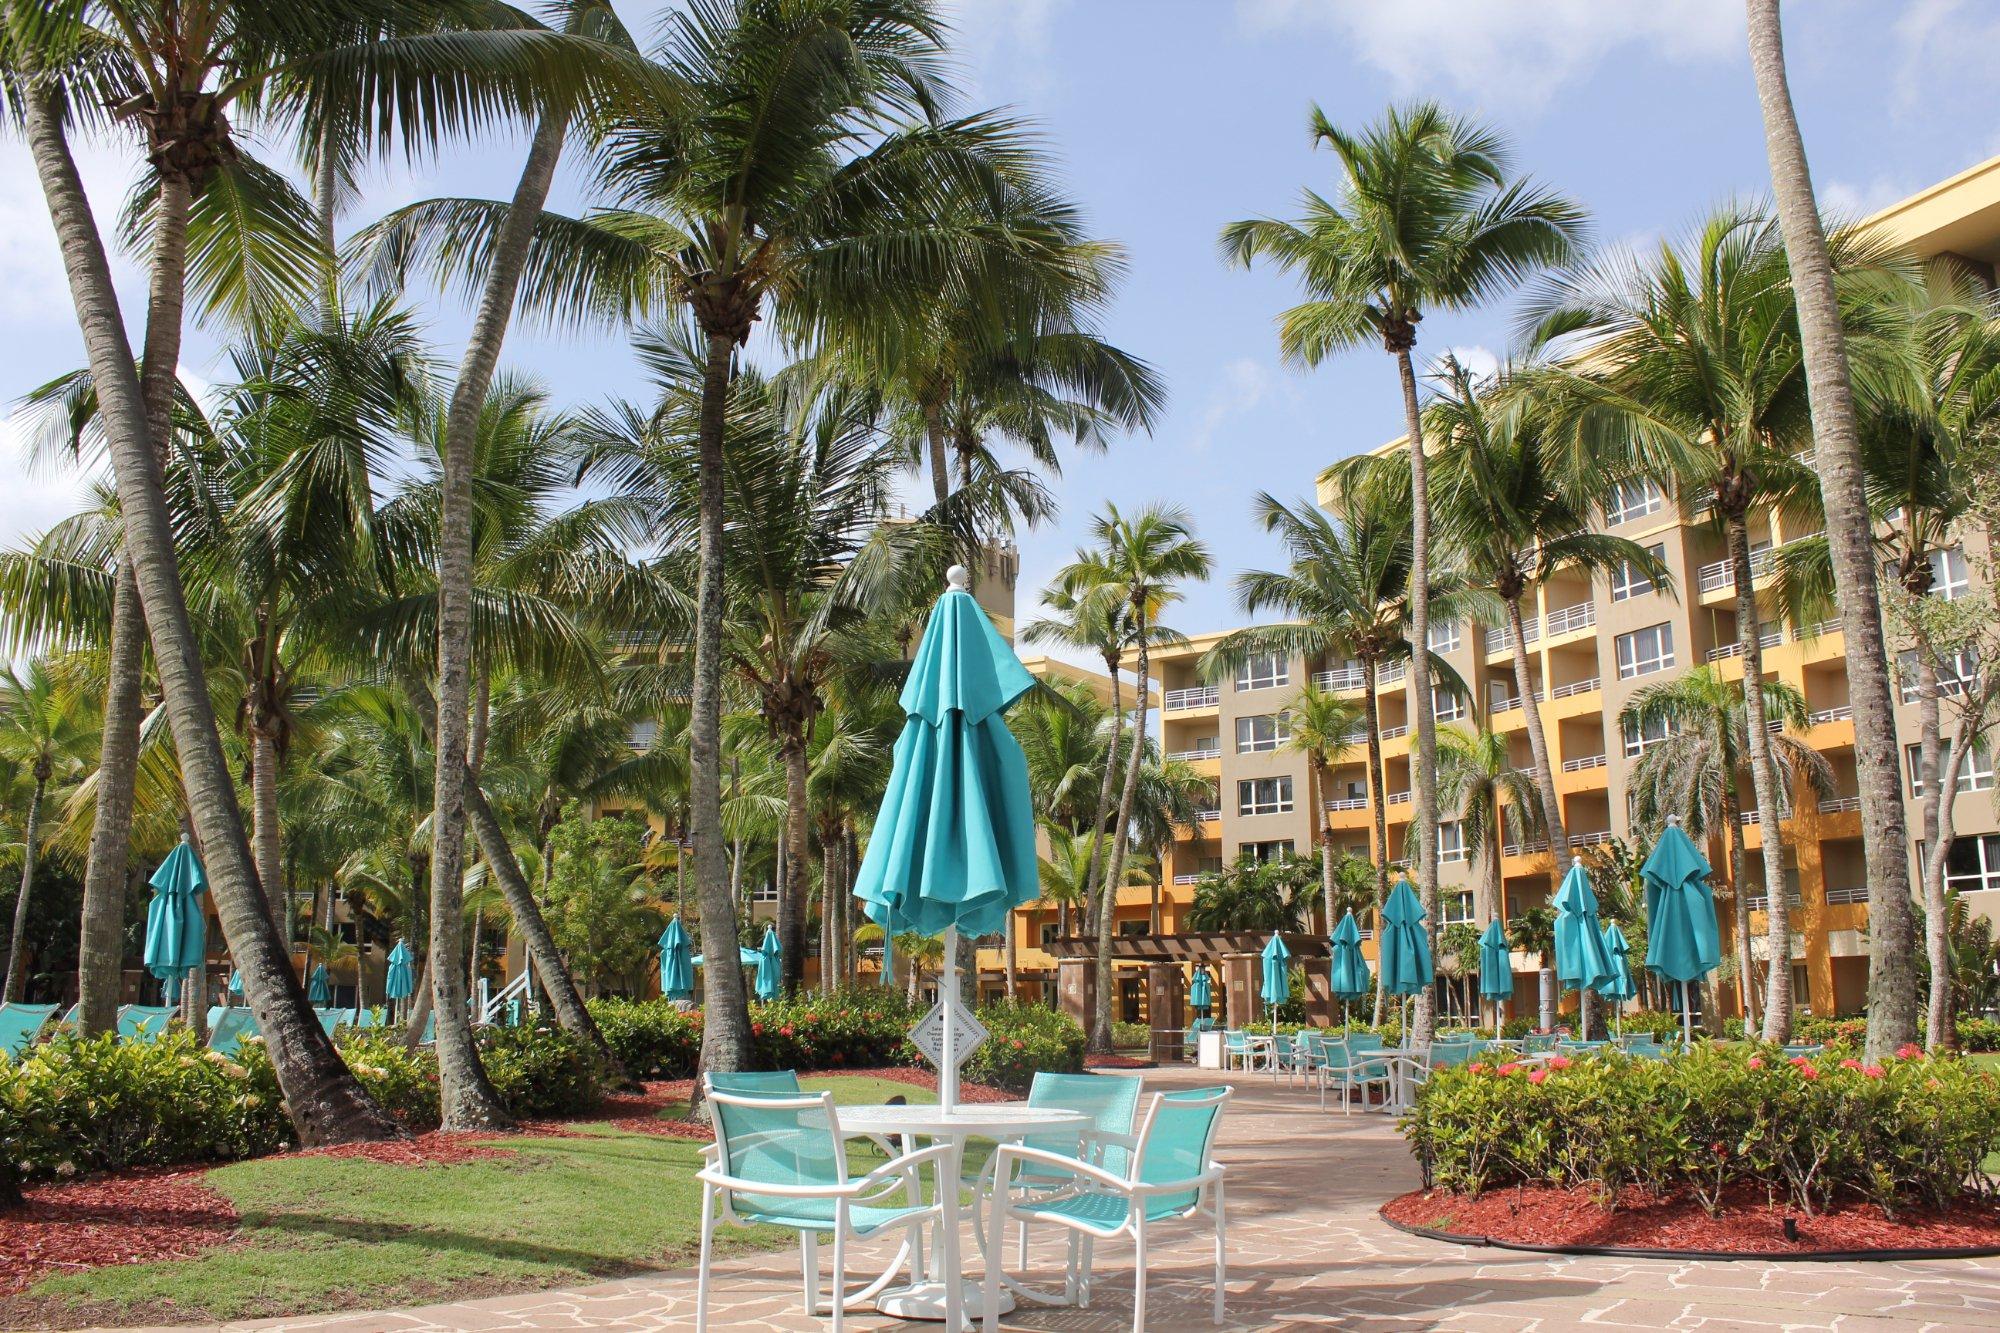 Hyatt Hacienda Del Mar Outisde Lounge